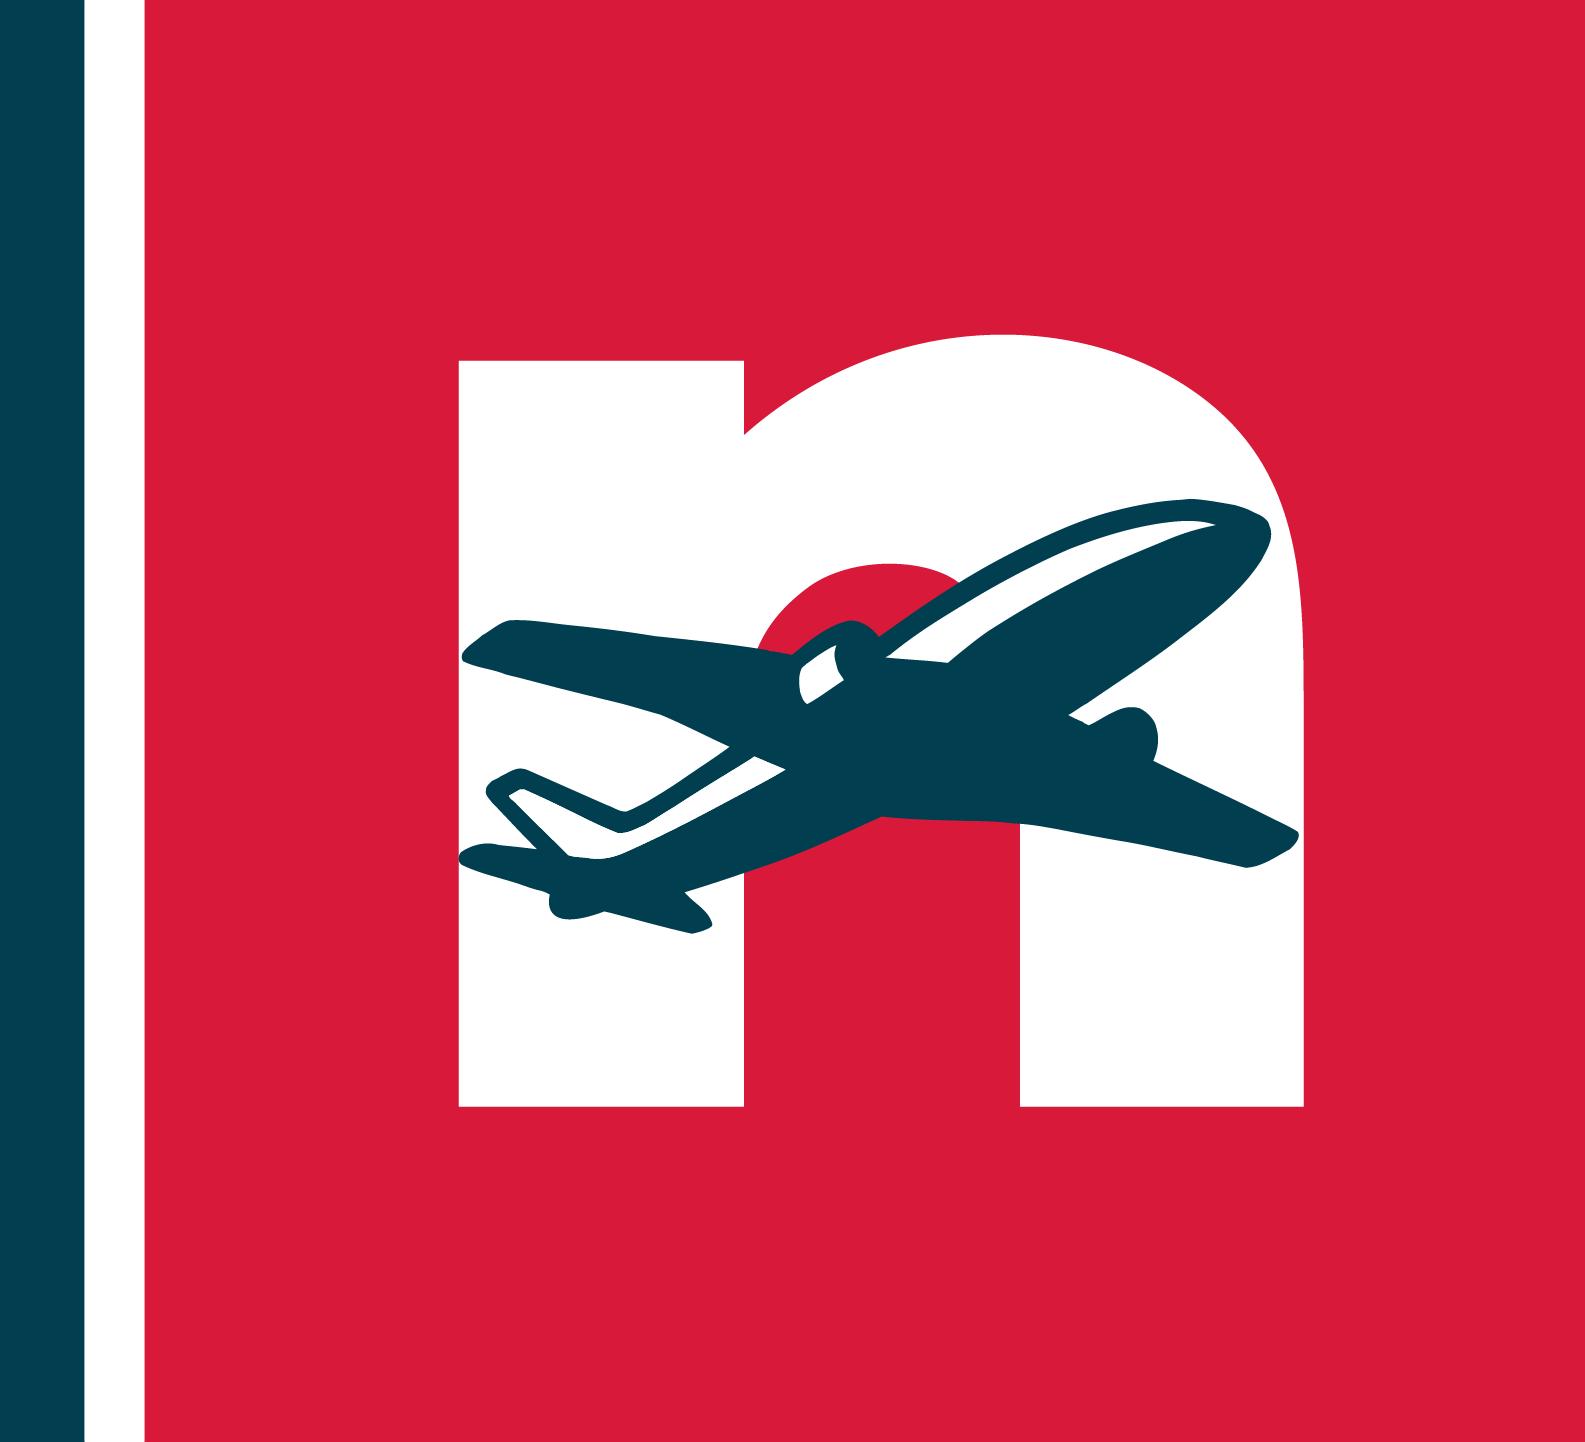 Norwegian Air International LTD